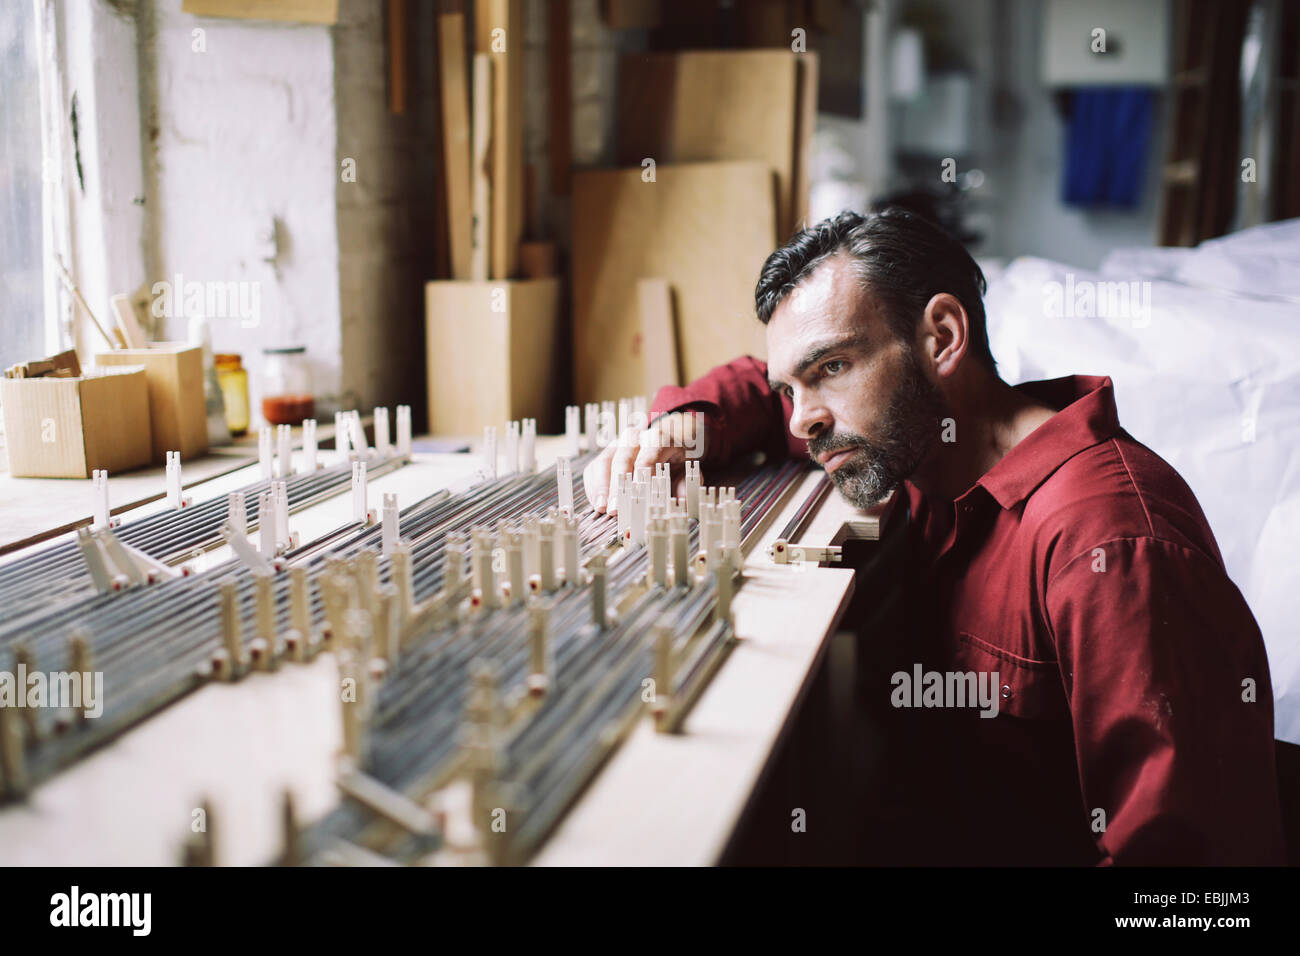 Mature craftsman checking organ pipes in pipe organ workshop - Stock Image